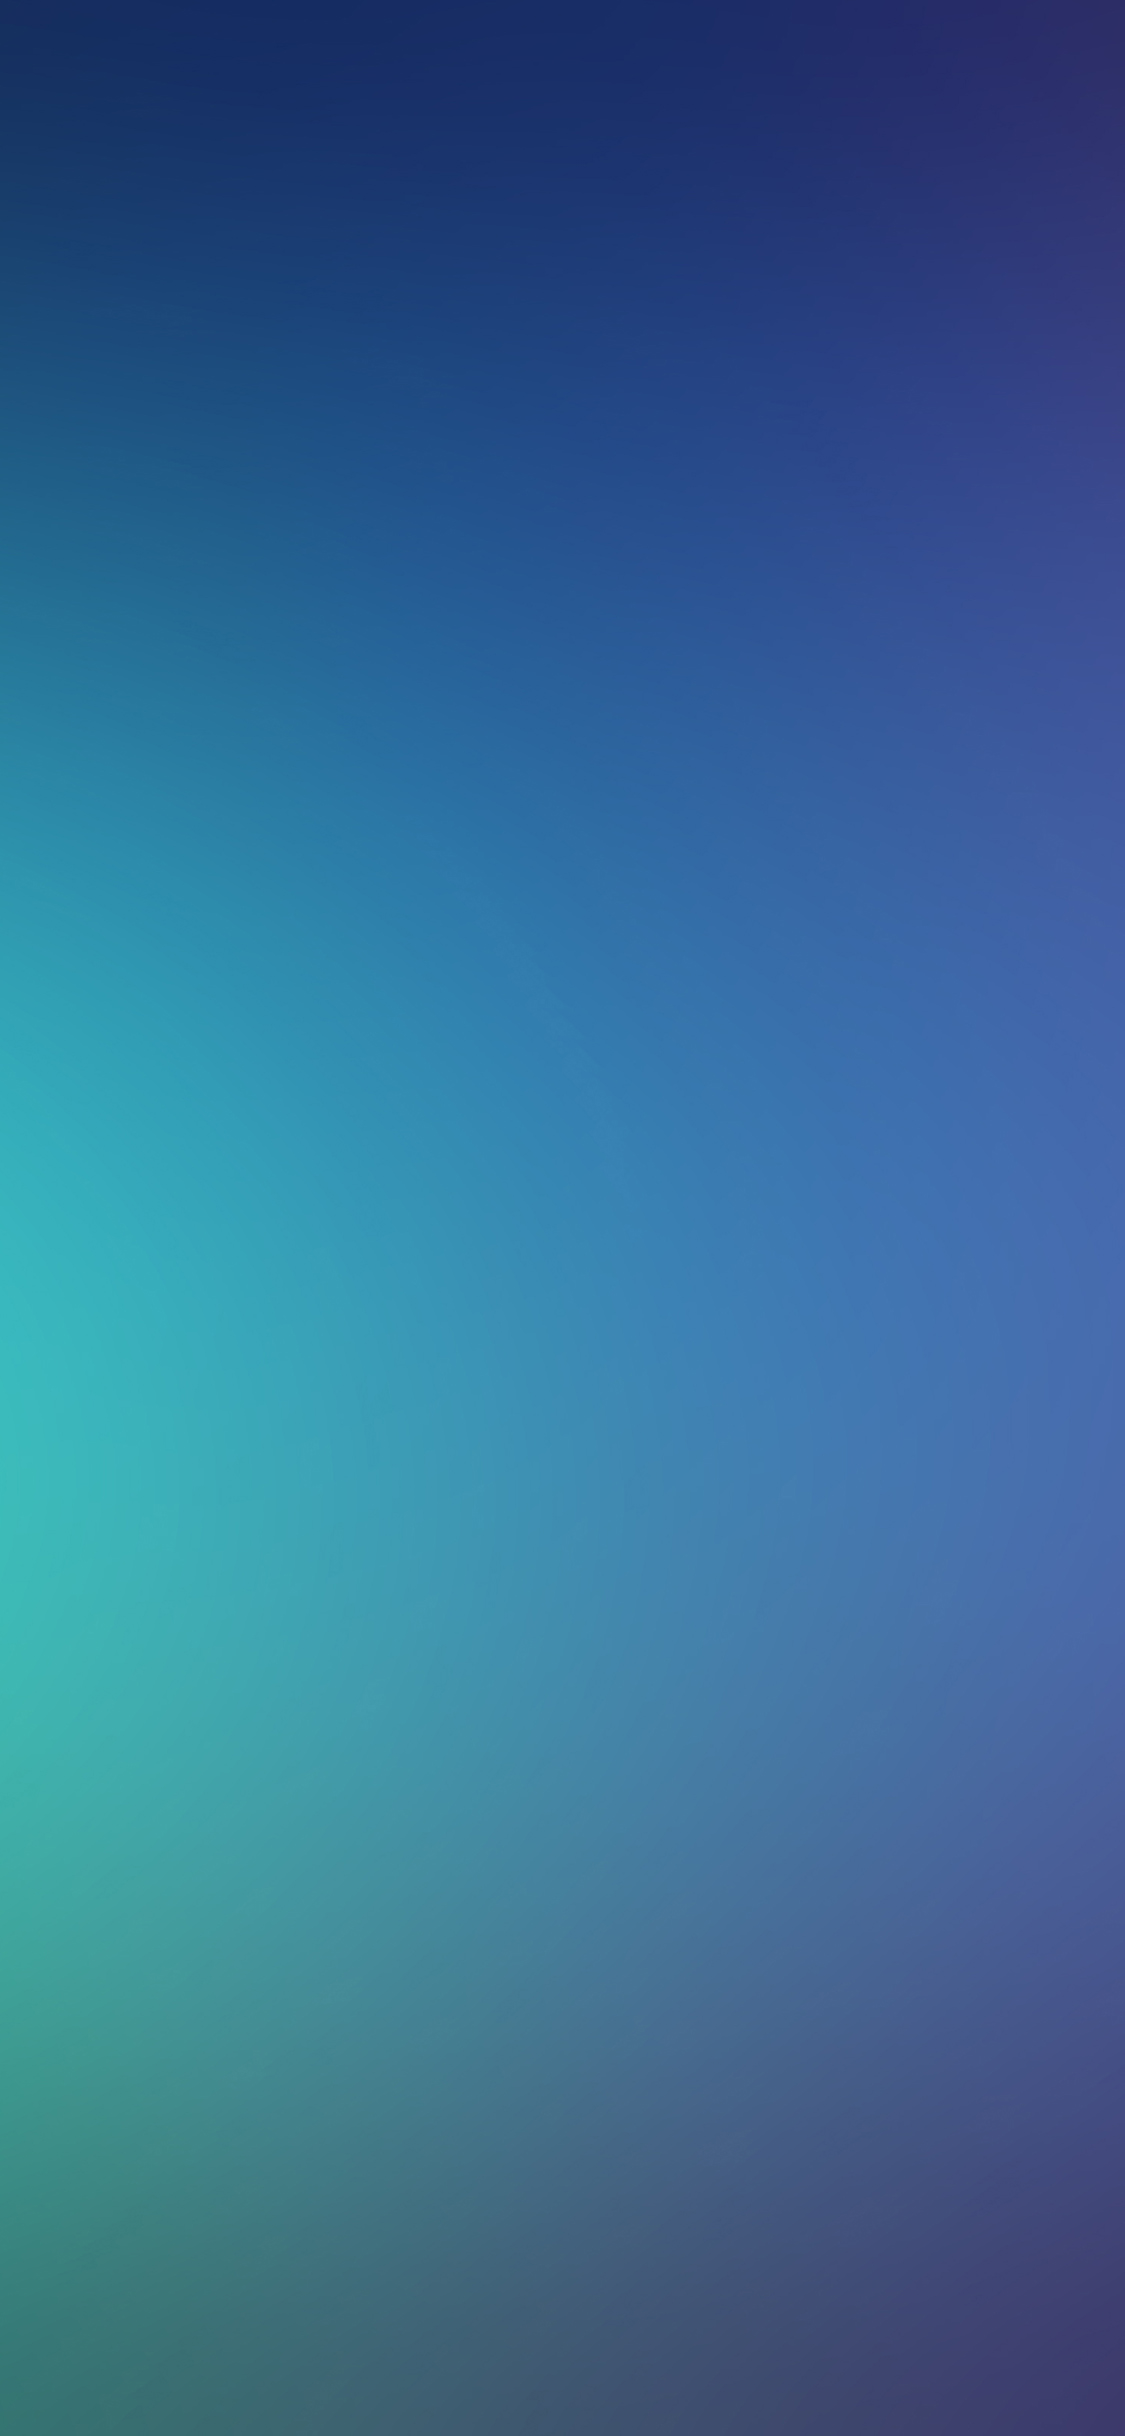 Blackberry Black Wallpaper Sd69 Blue Windows Green Gradation Blur Papers Co